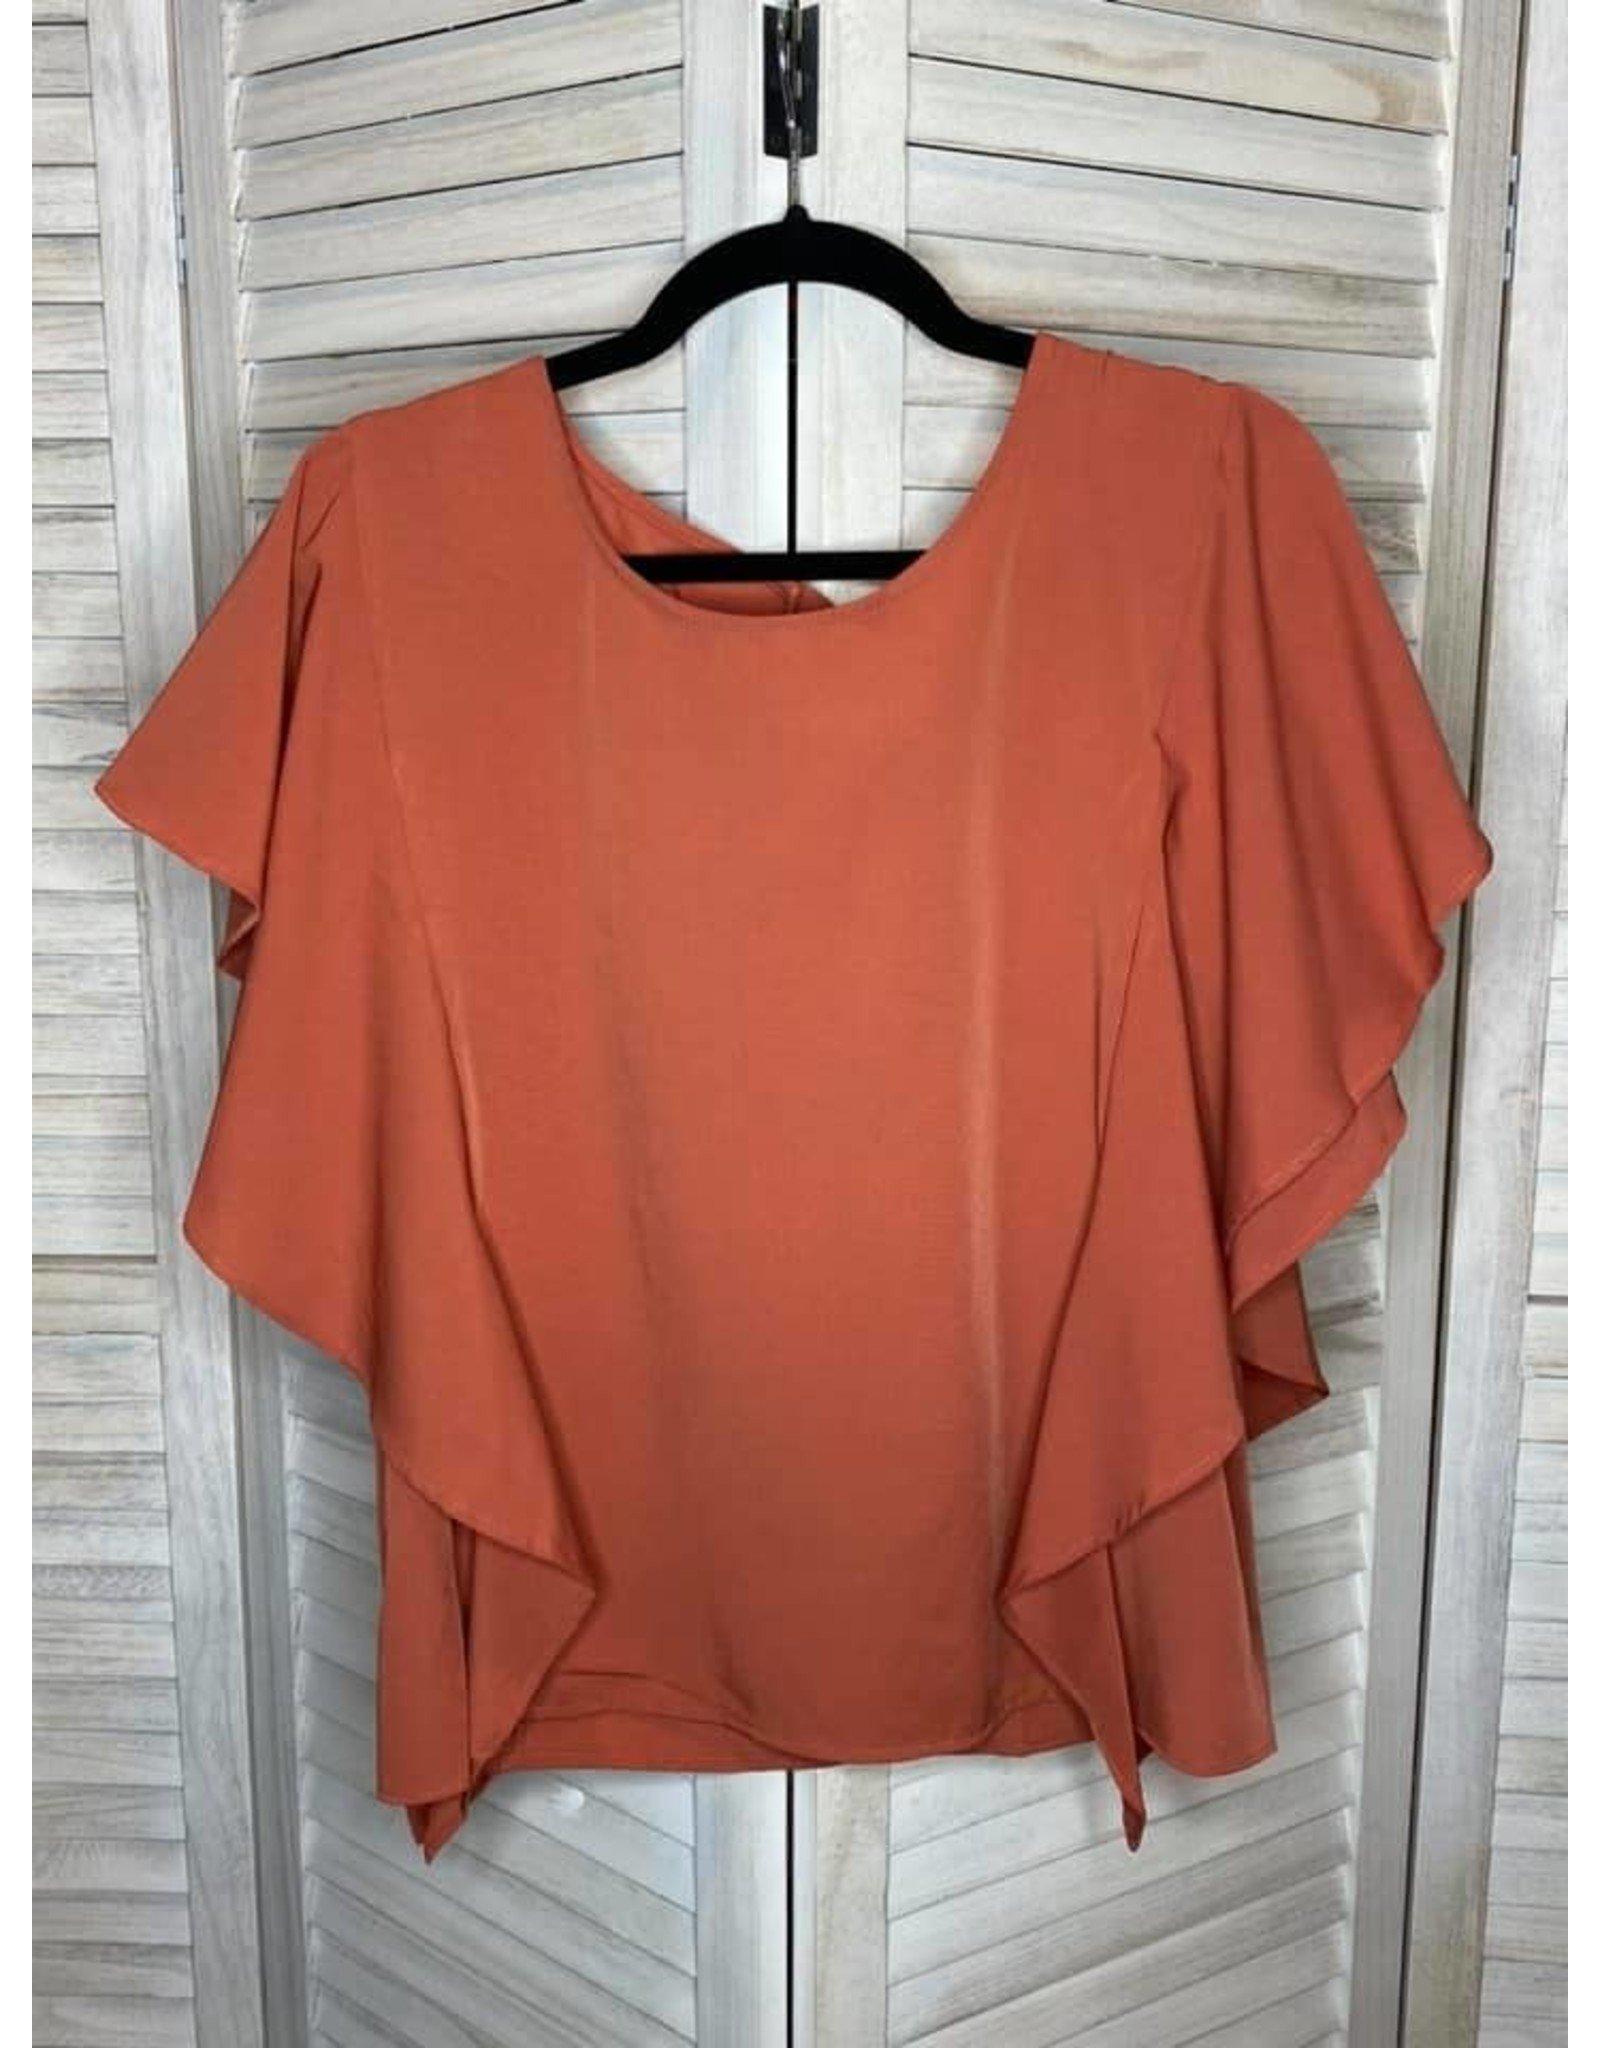 Umgee Burnt Orange Ruffle Detail and Tie Back Top